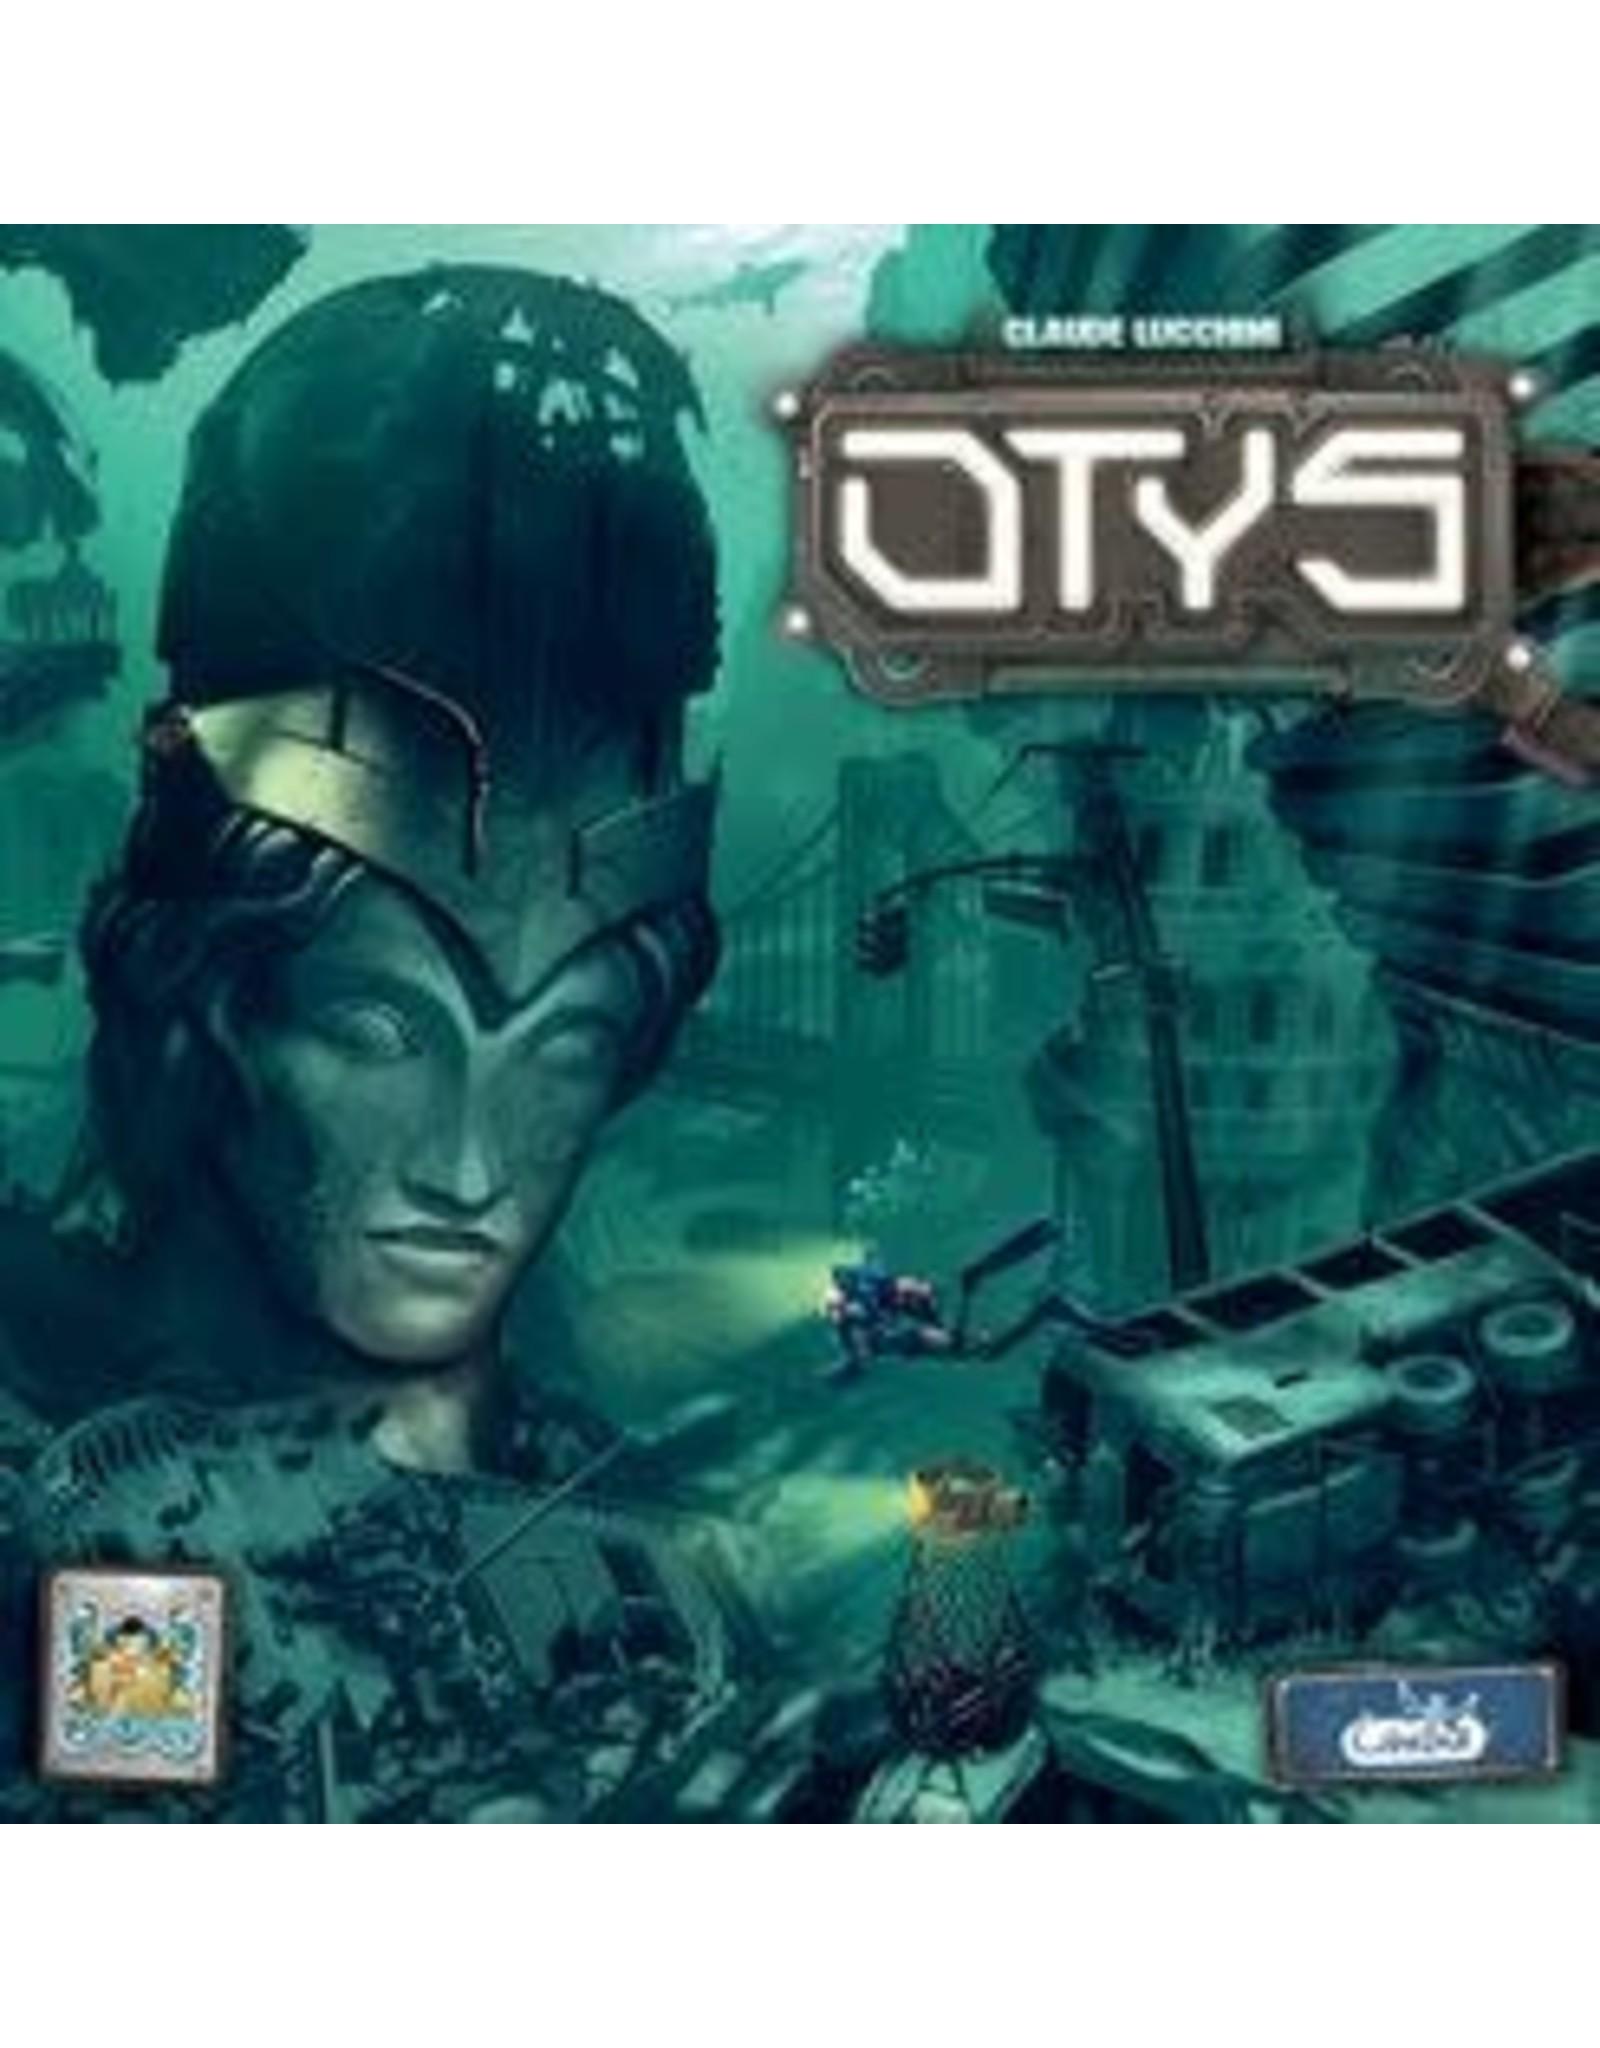 Otys Board Game